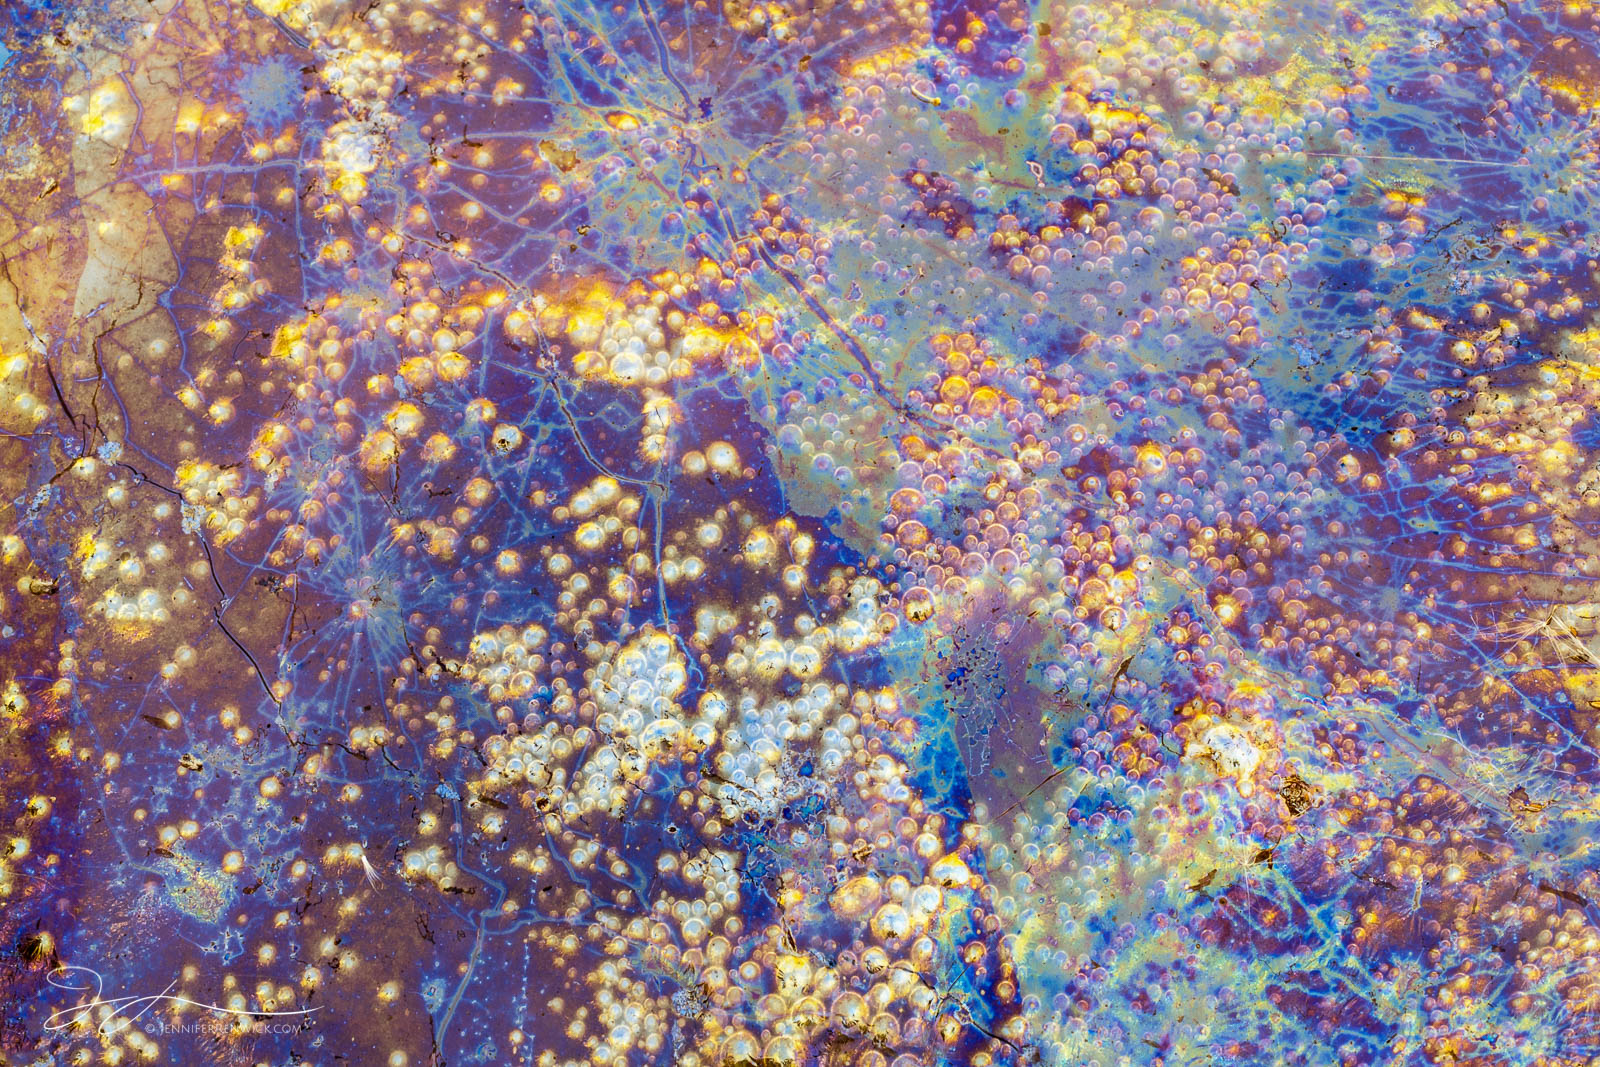 abstract photography, Colorado plateau, desert oils, Utah, macro, desert, canyon, natural oils, photo